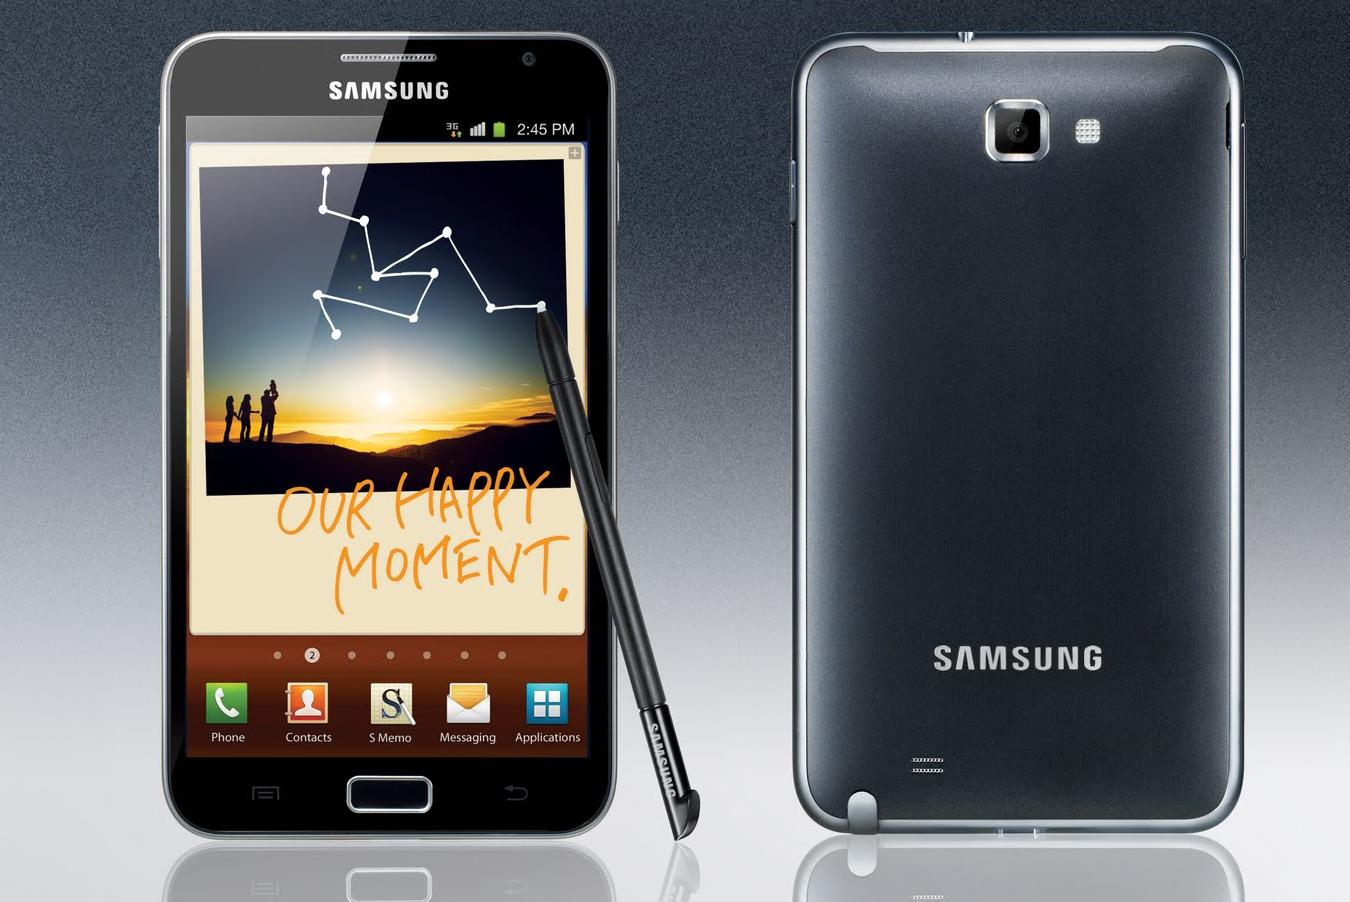 Samsung Galaxy Note Price